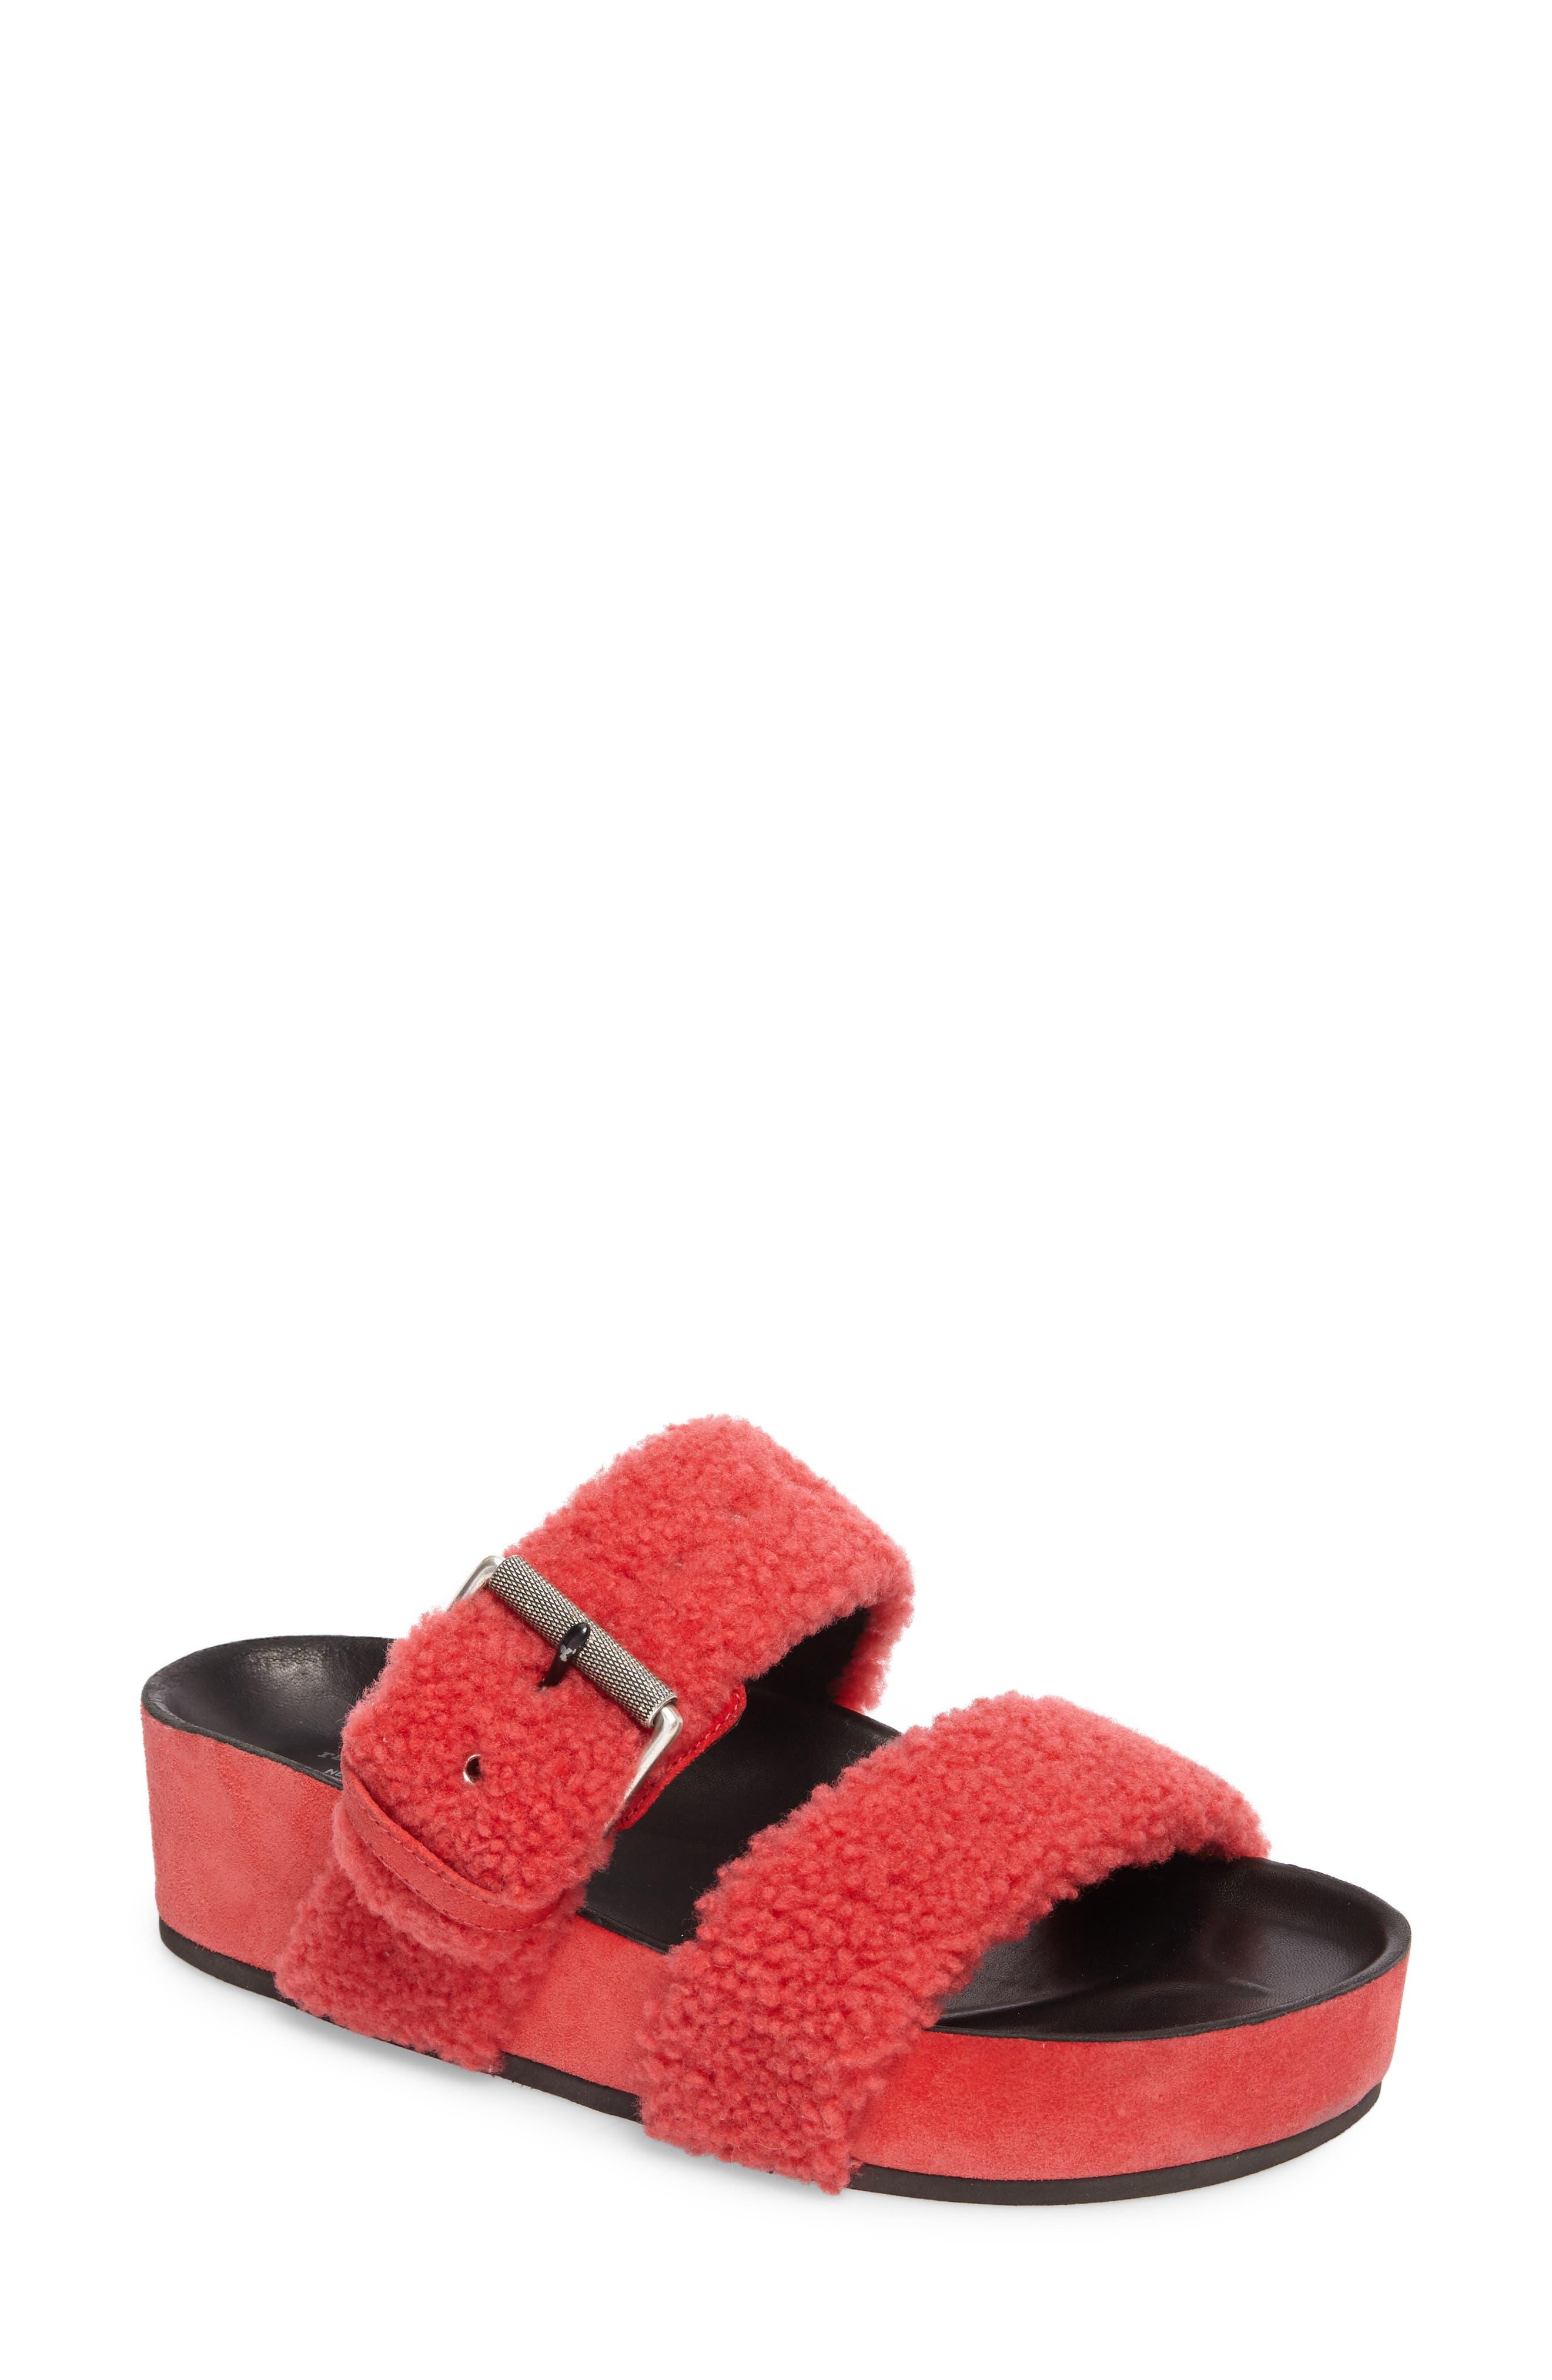 Evin Genuine Shearling Slide Sandal,                         Main,                         color, Berry